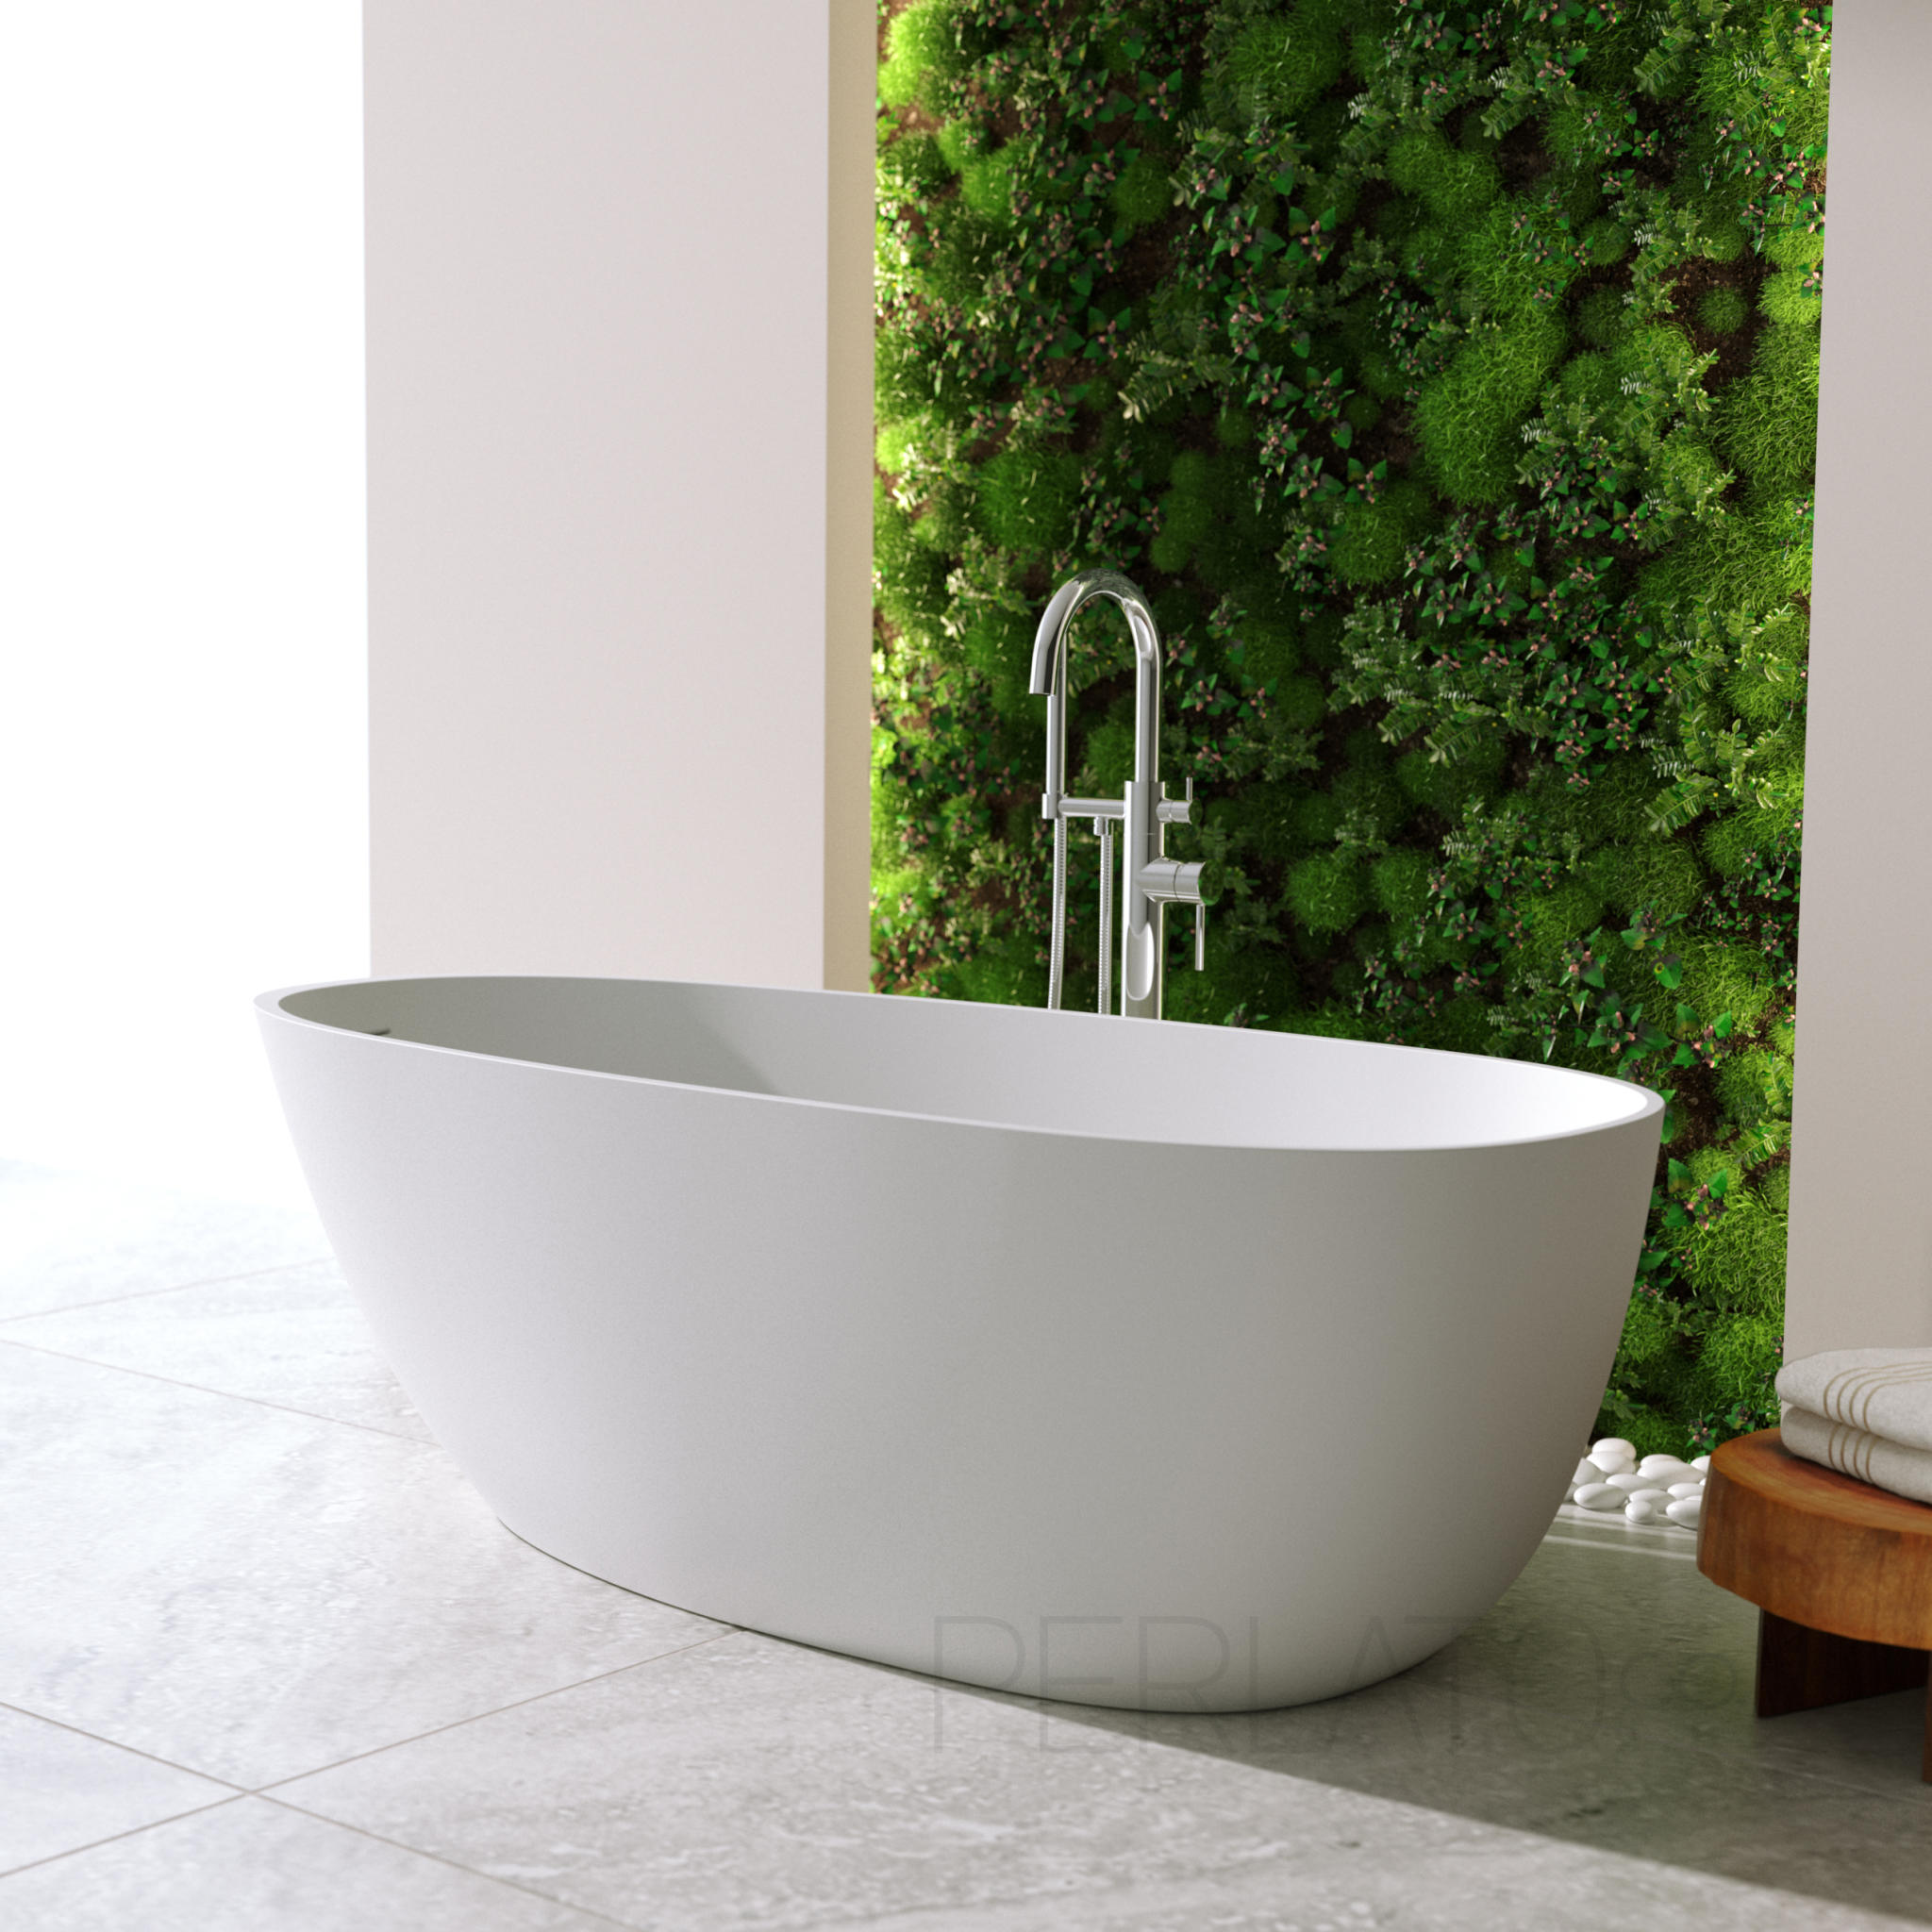 Shop Quality Bath\'s Plunging Black Friday Deals! - Abode